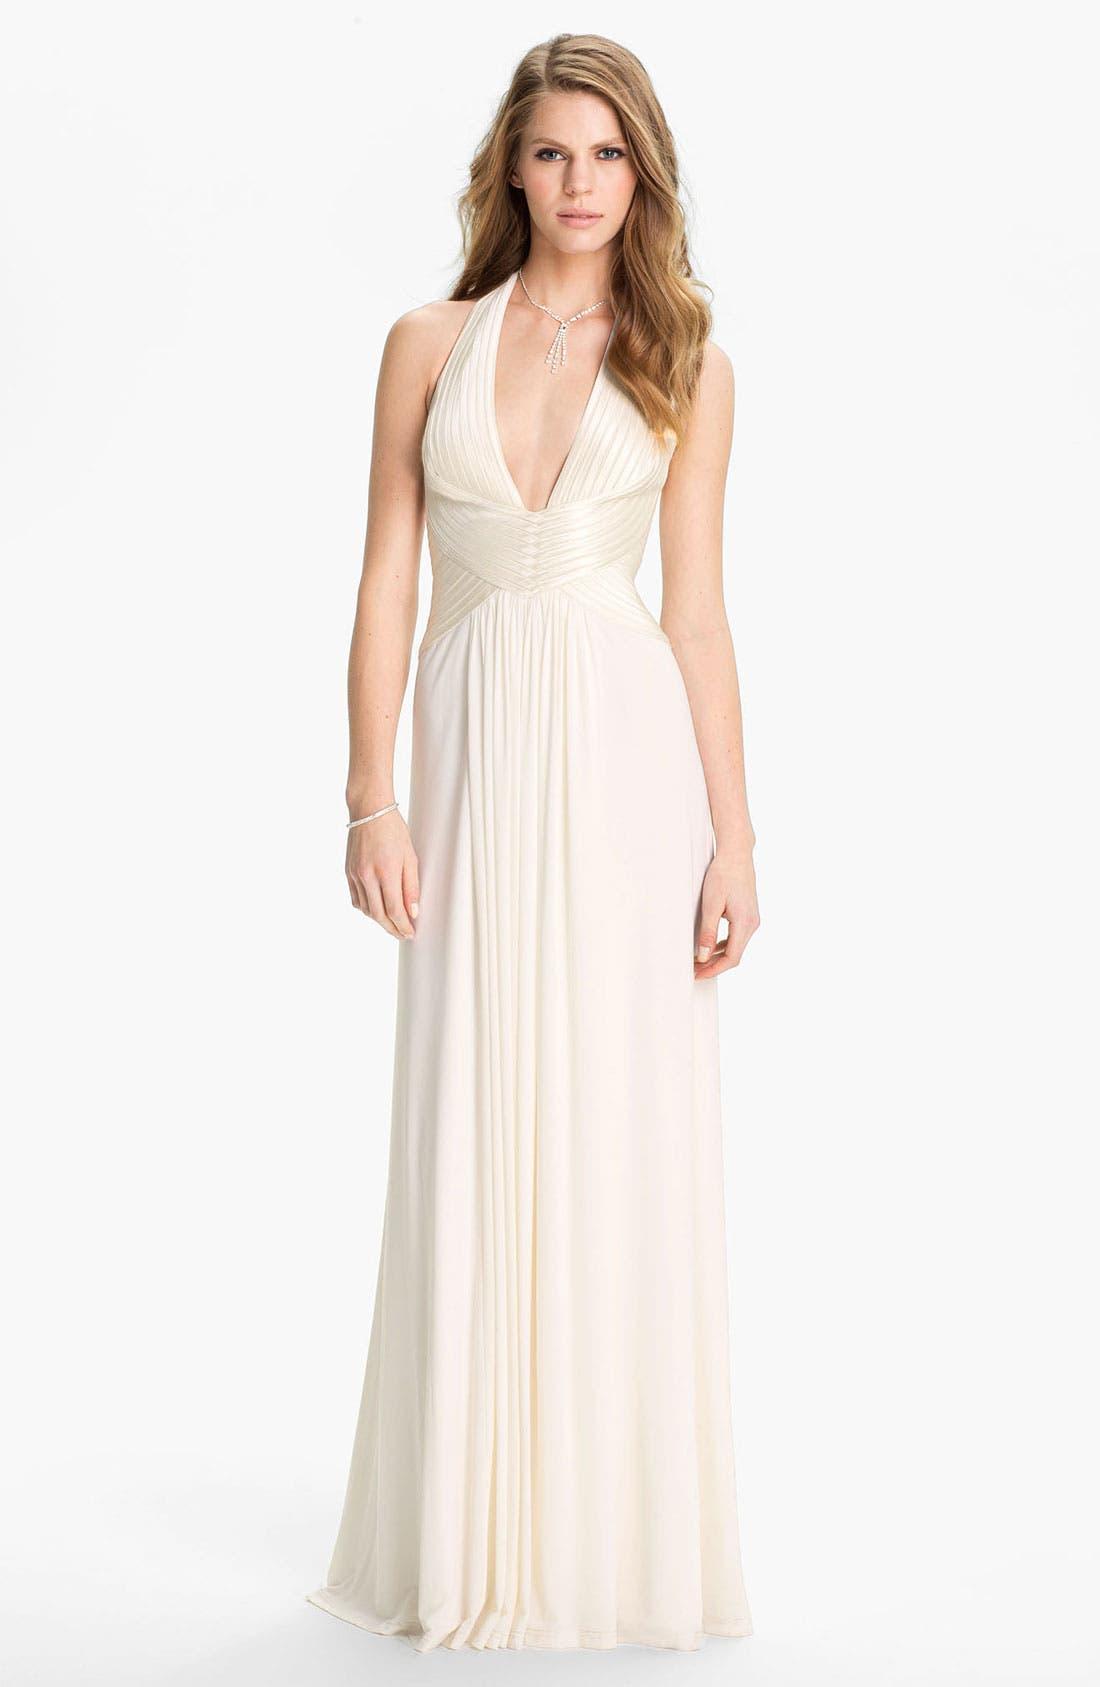 Alternate Image 1 Selected - BCBGMAXAZRIA 'Anitra' Satin & Jersey Halter Gown